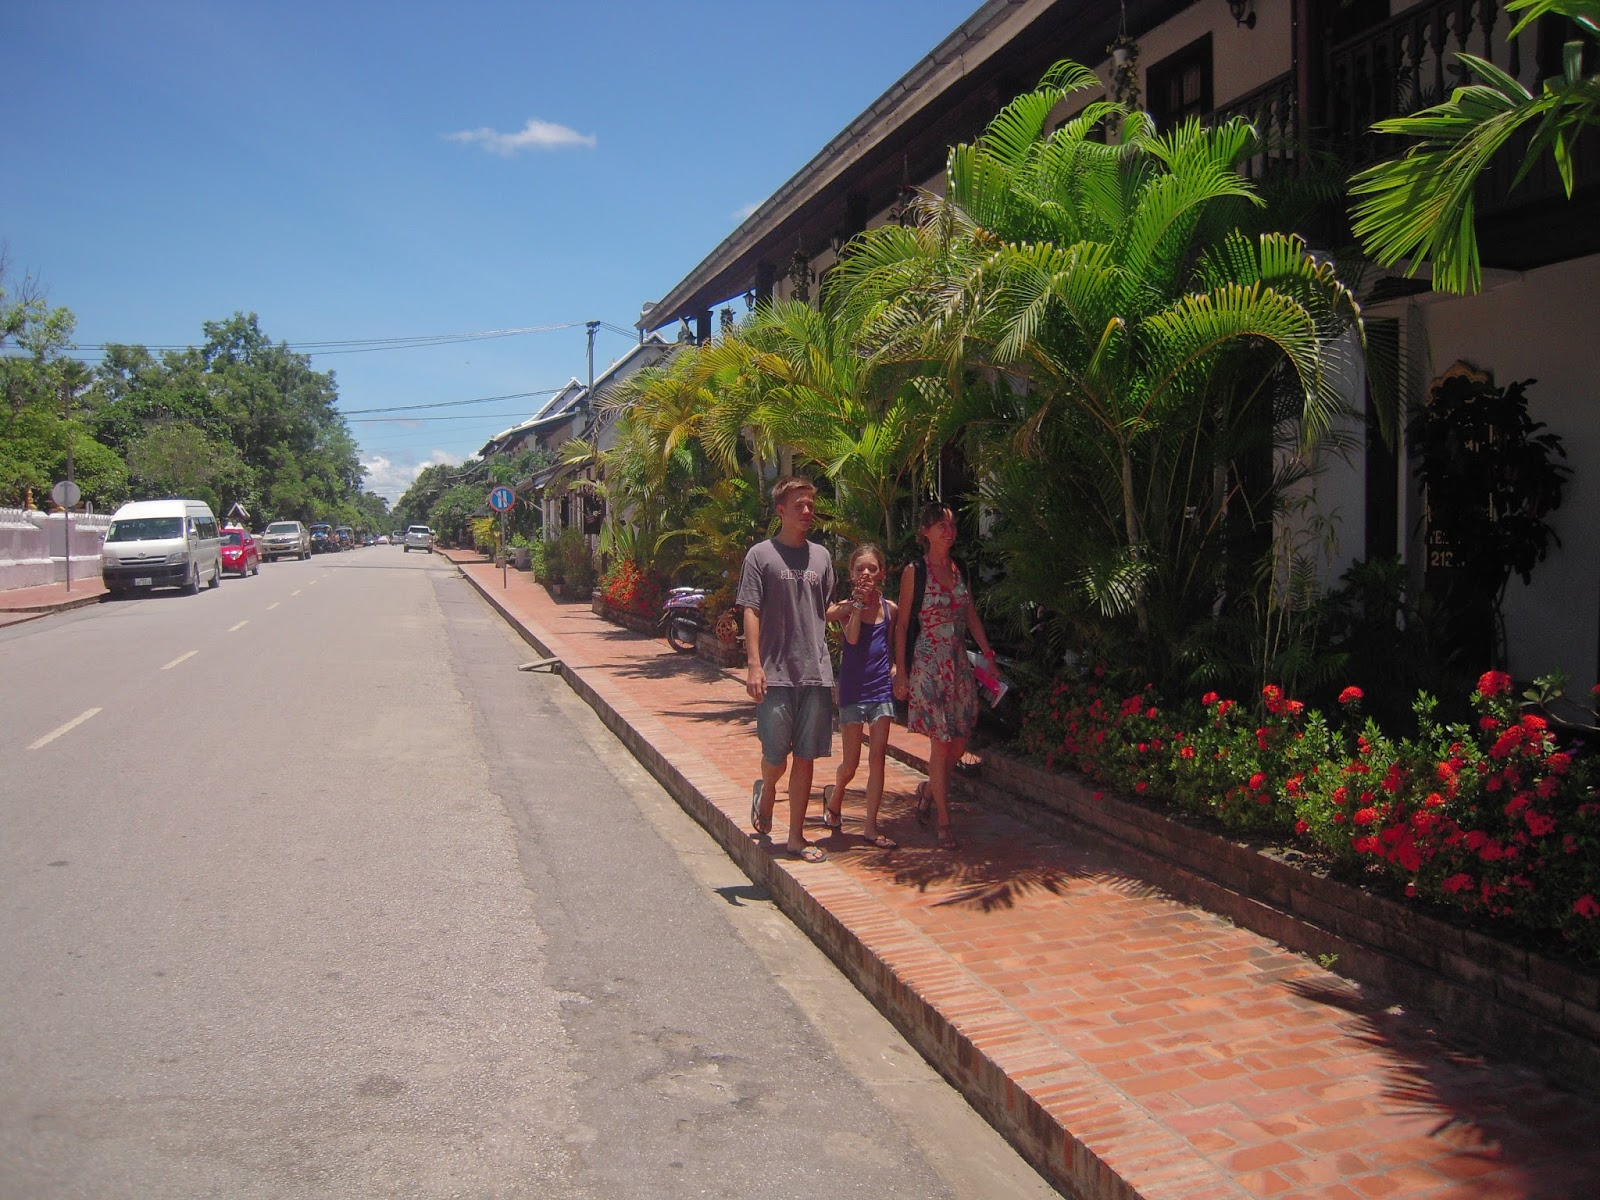 Carnet de route de gaston luang prabang for Chercher un hotel